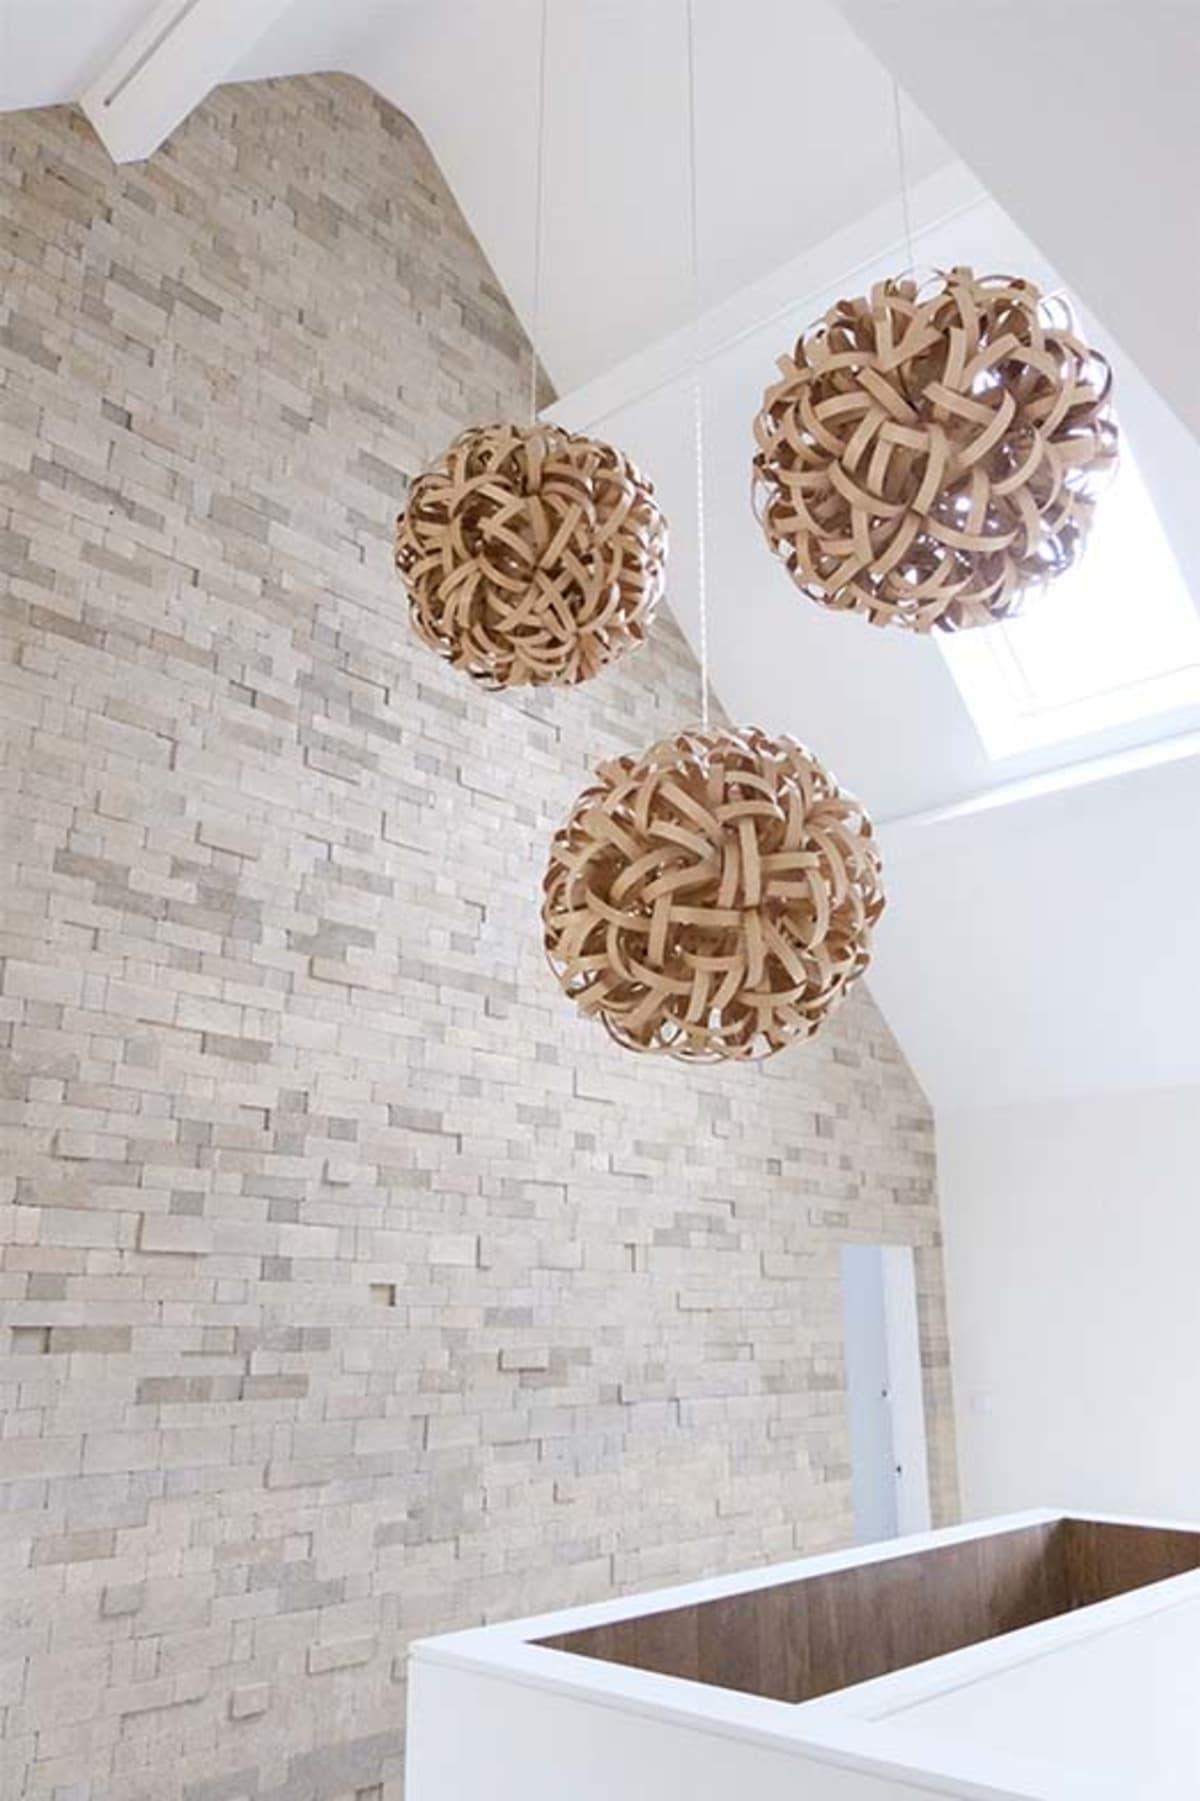 Internal brick wall with hanging lights